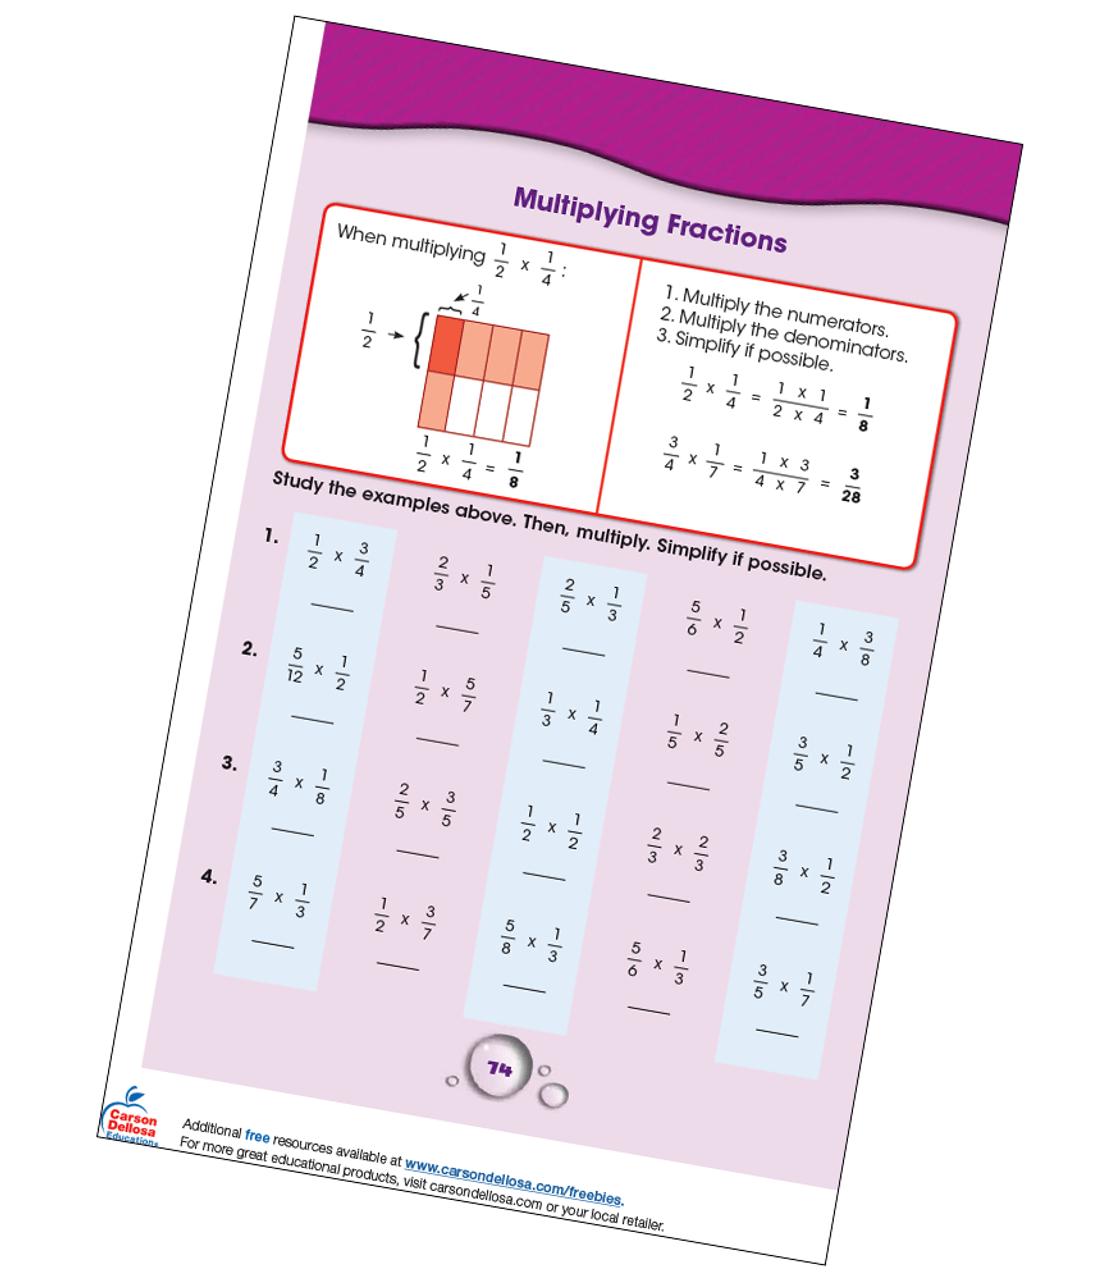 Multiplying Fractions Grade 4-5 Free Printable   Carson Dellosa [ 1280 x 1120 Pixel ]